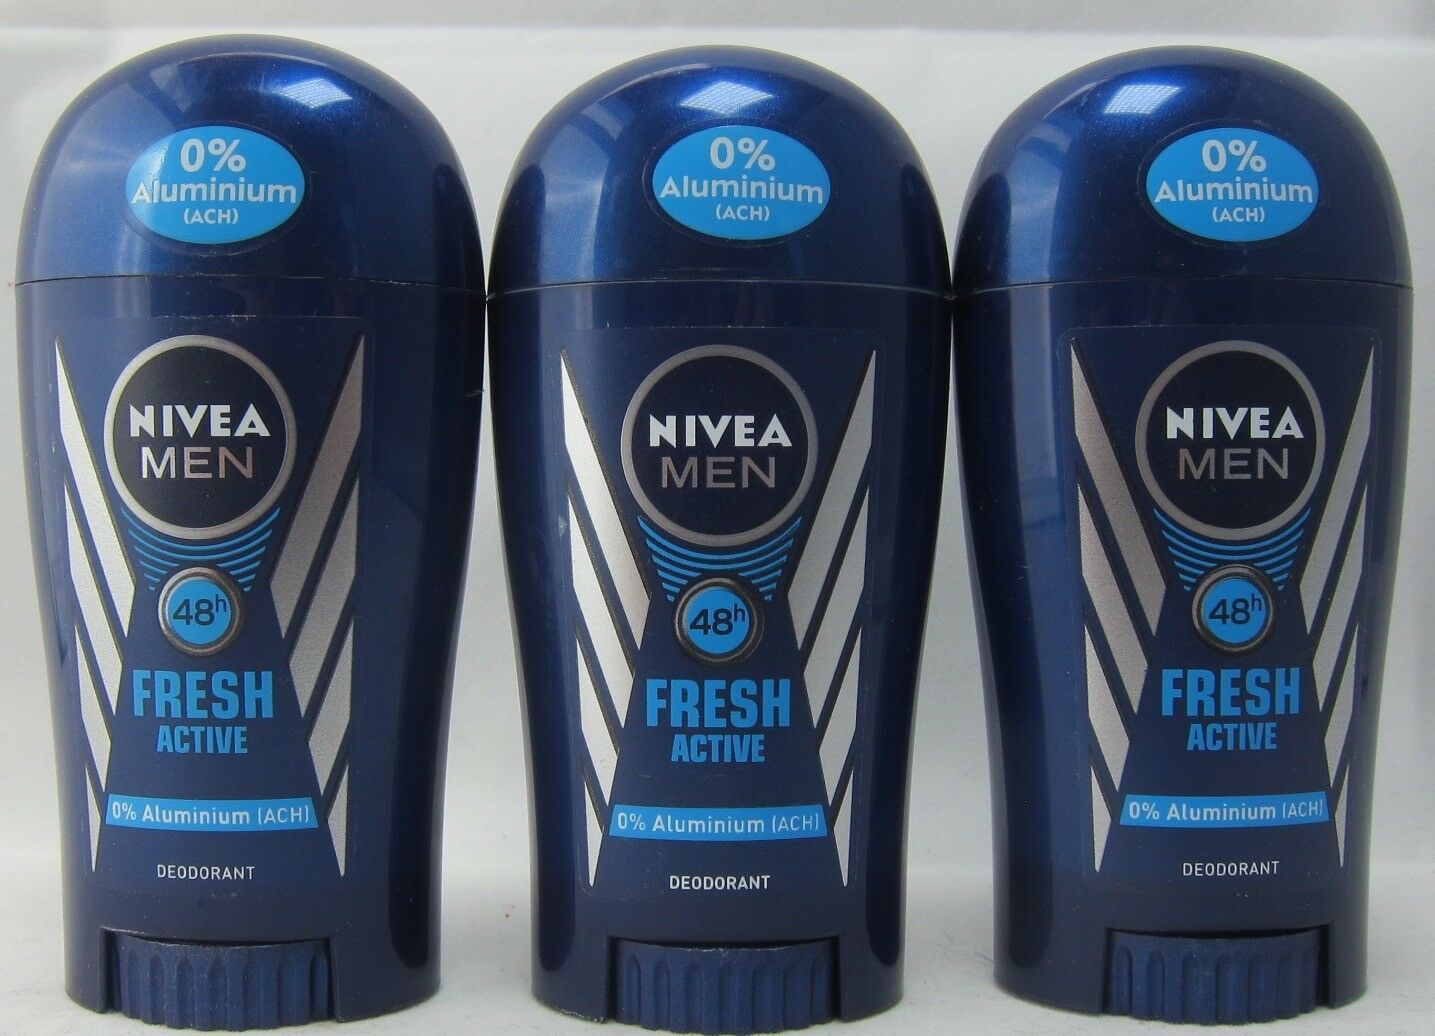 Nivea Men Fresh Active roll-on deodorant anti-perspirant 3 x 40ml- FREE SHIPPING